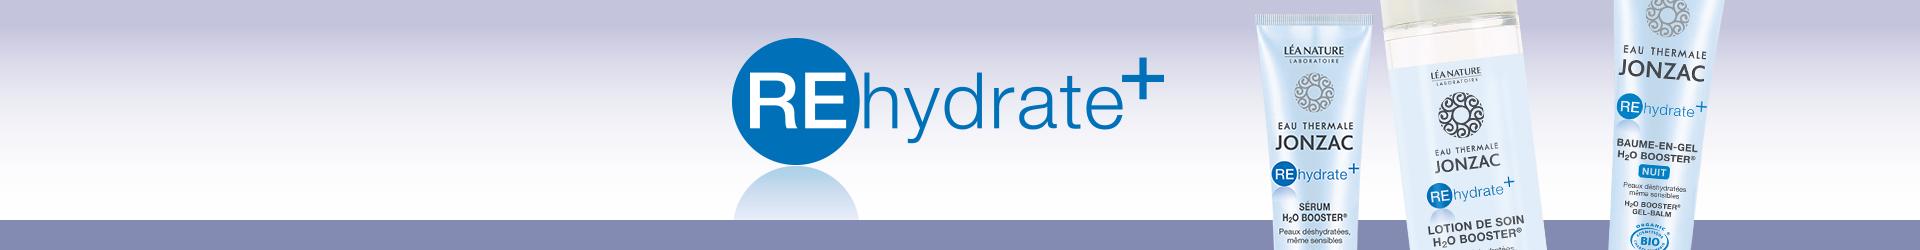 gamme-rehydrate-plus-jonzac